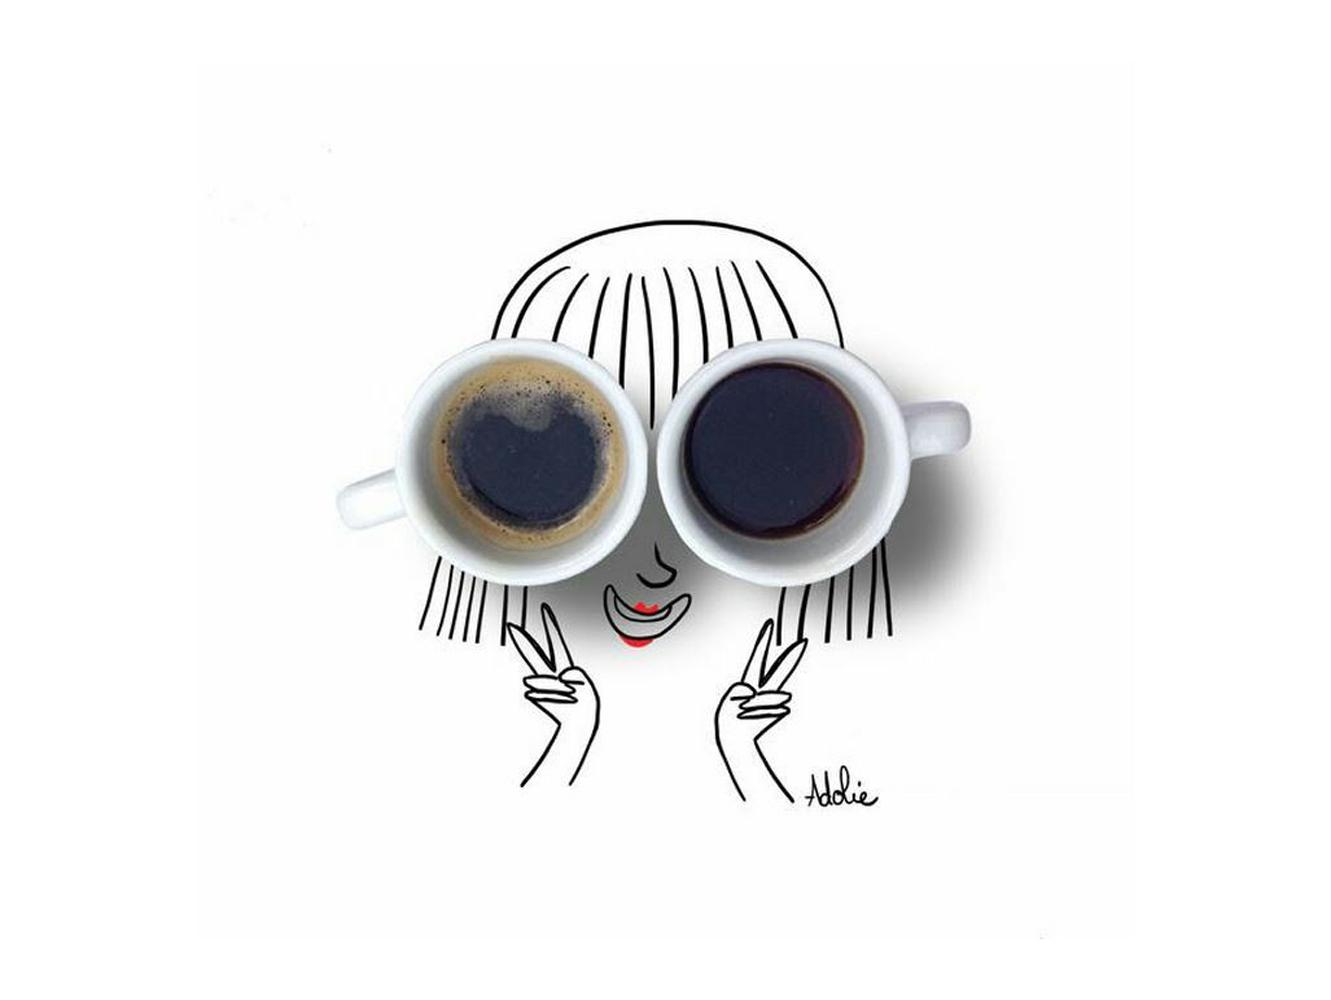 Adolie Day Illustration